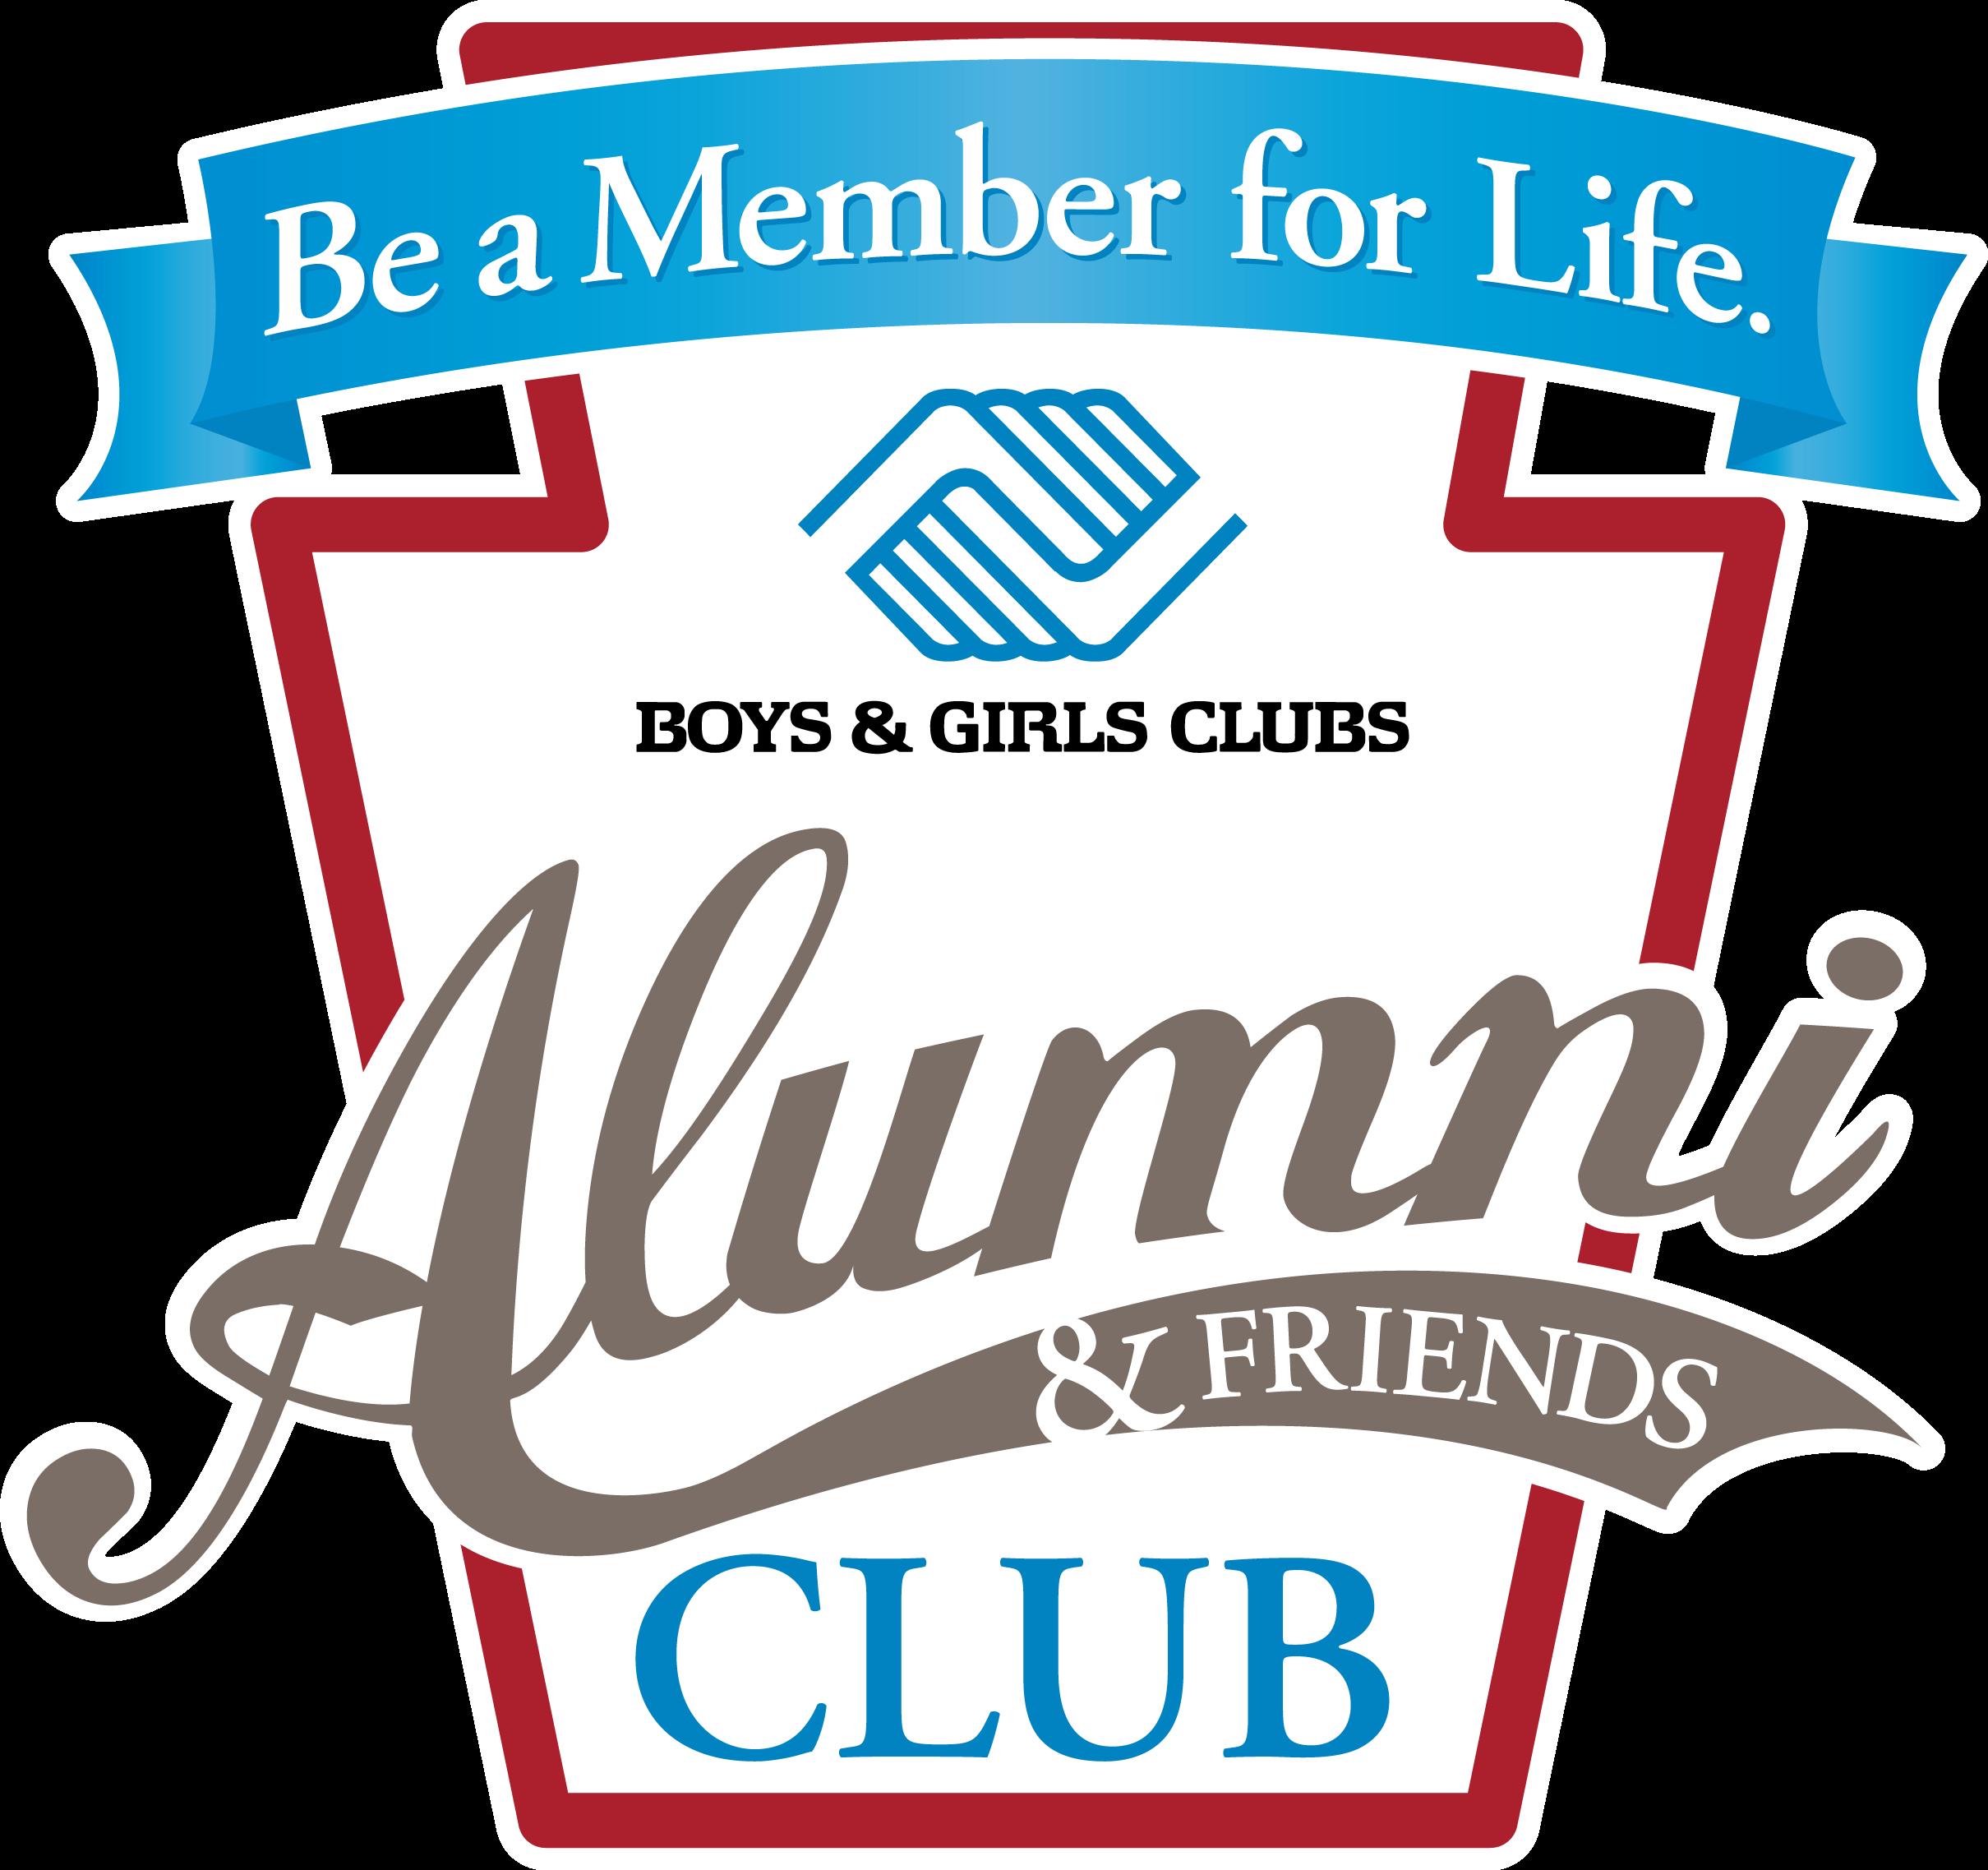 Alumni and Friends Club